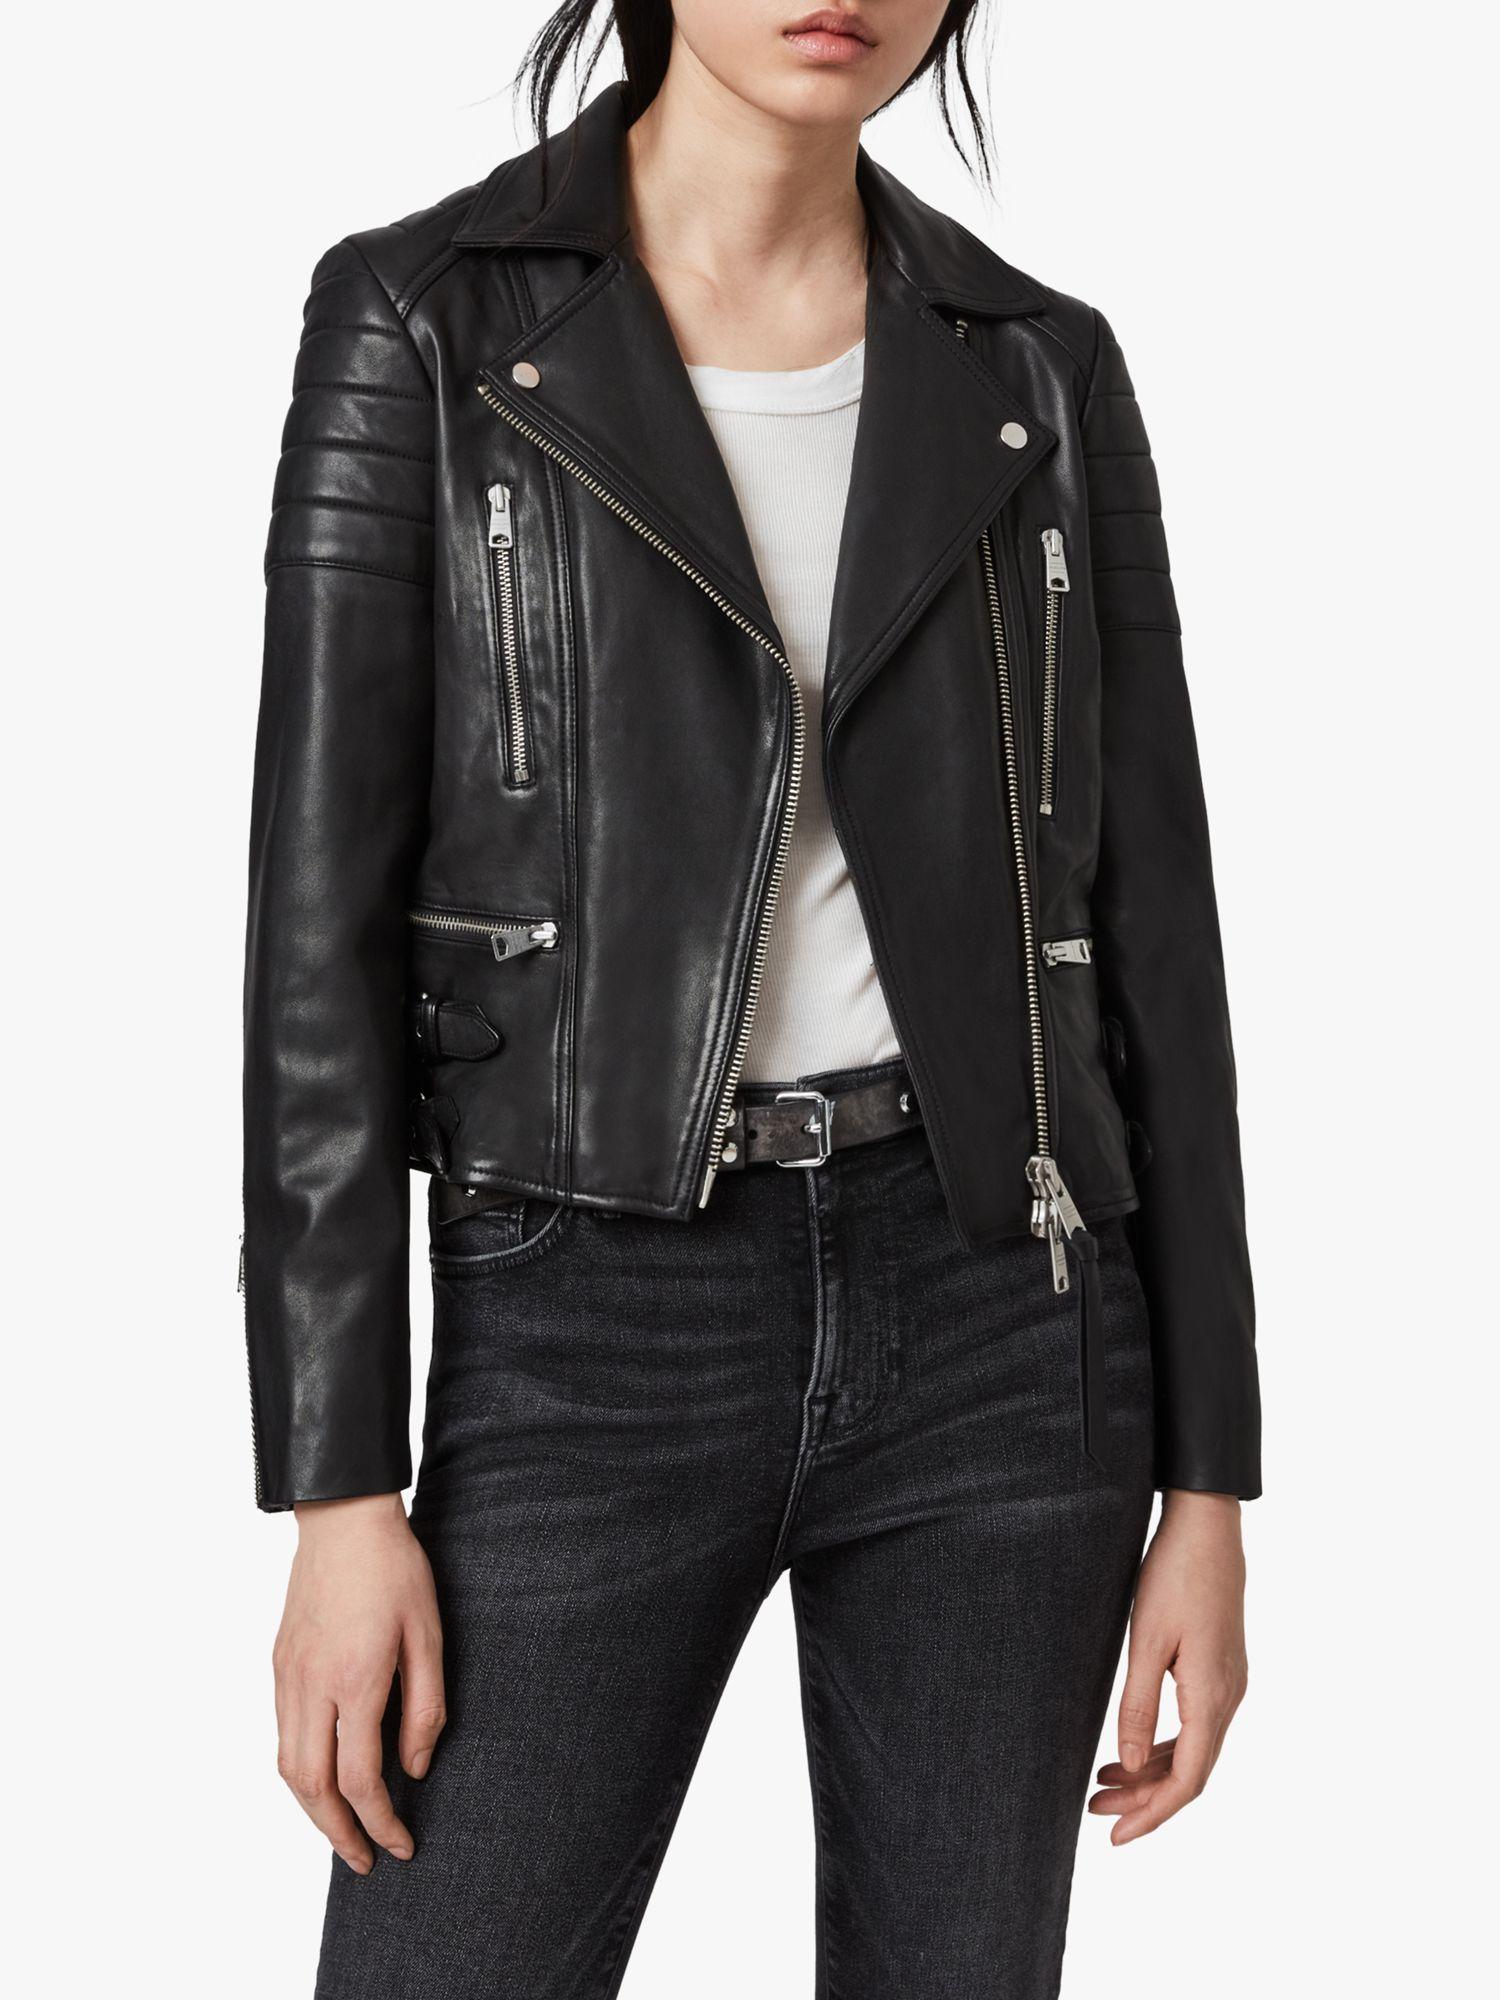 AllSaints AllSaints Halley Leather Biker Jacket, Black